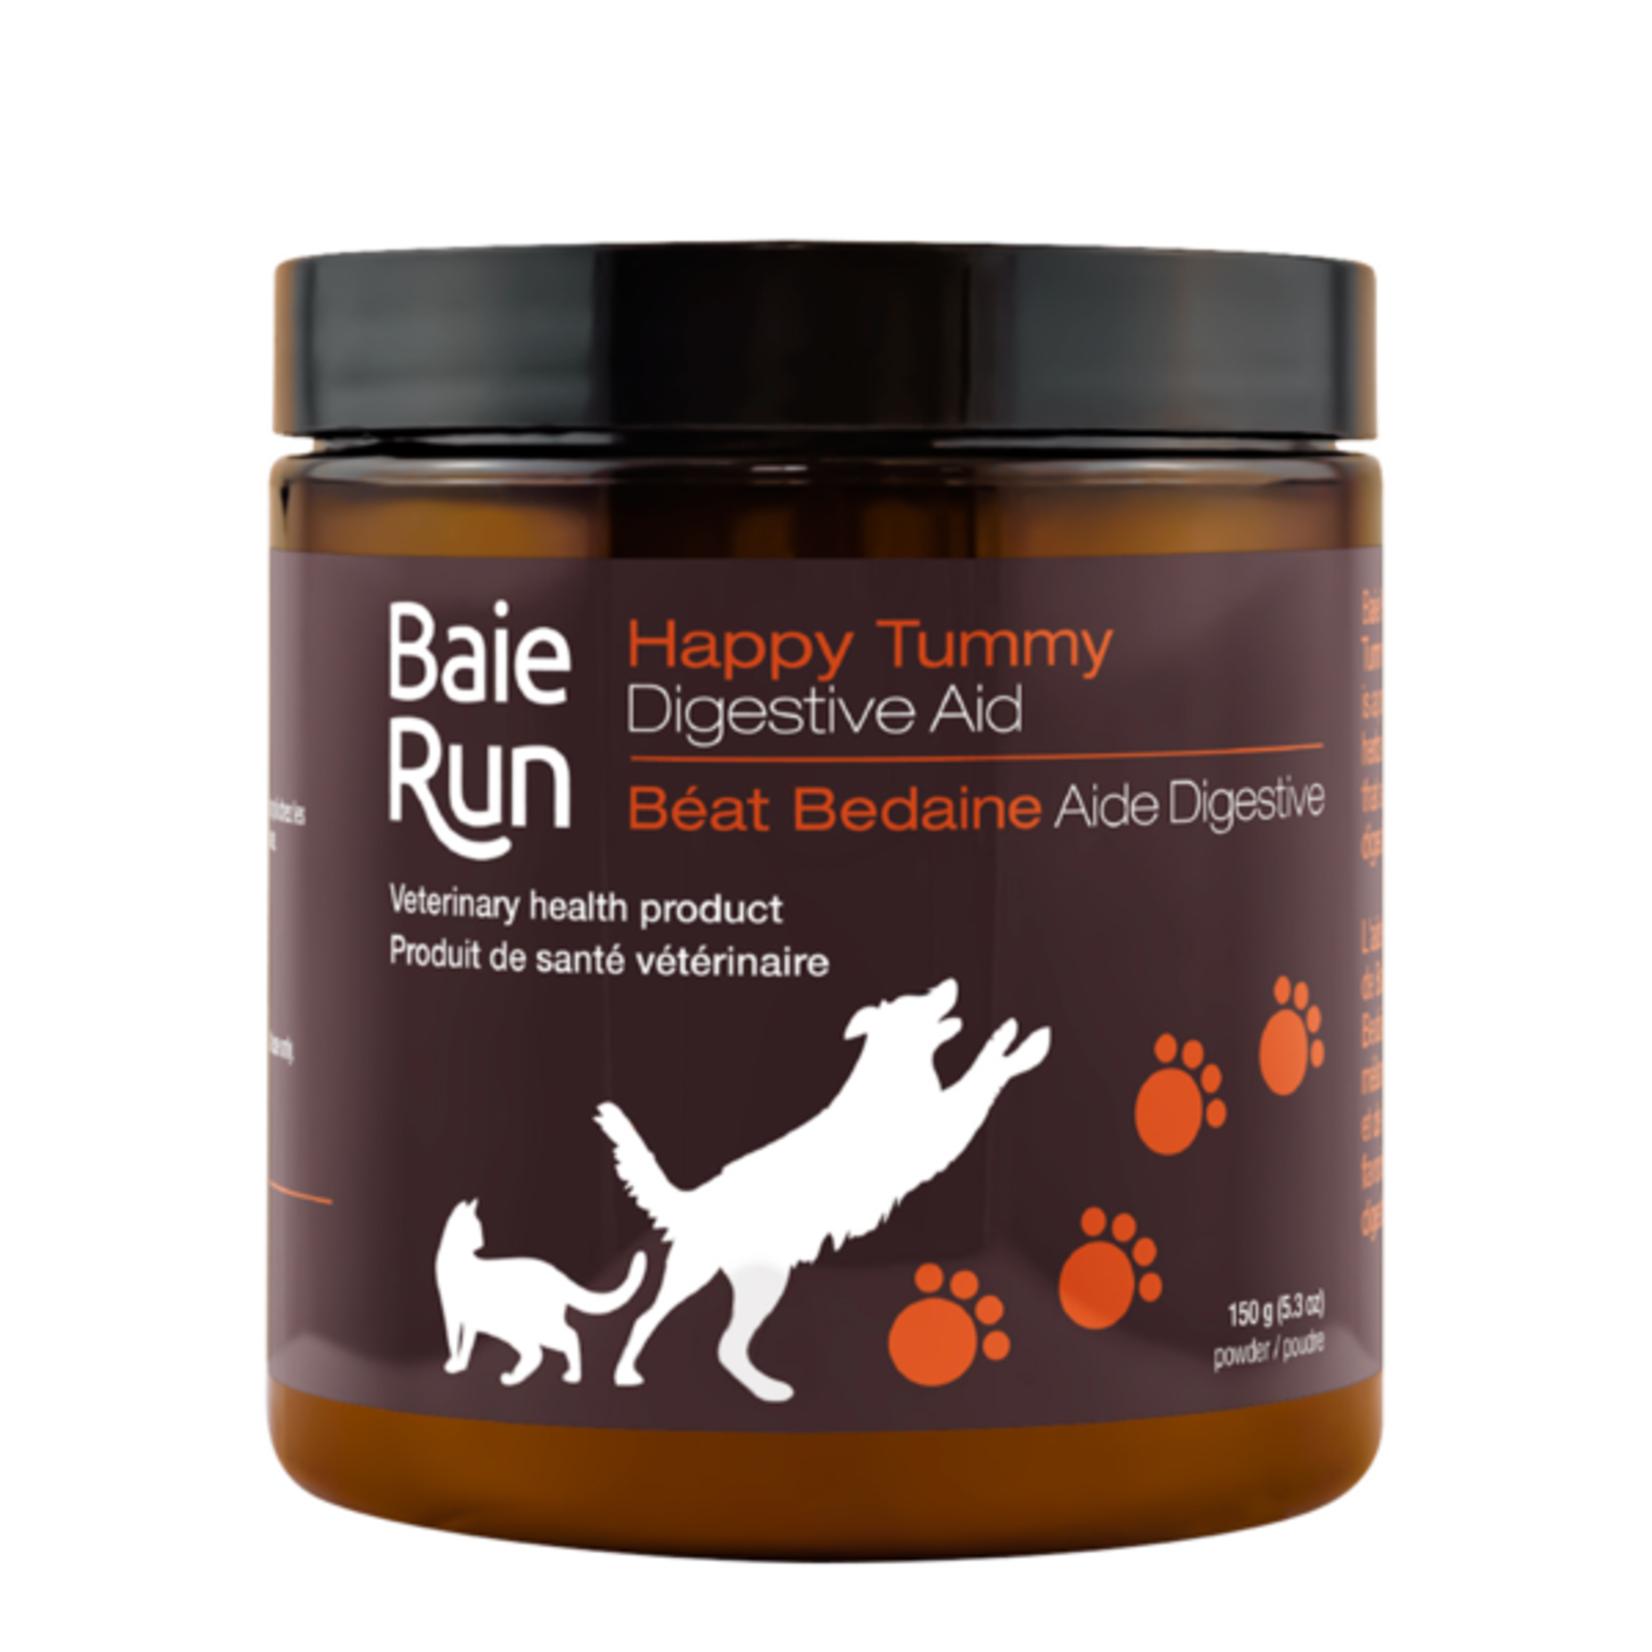 Baie Run Baie Run Happy Tummy Digestive Aid (150g)